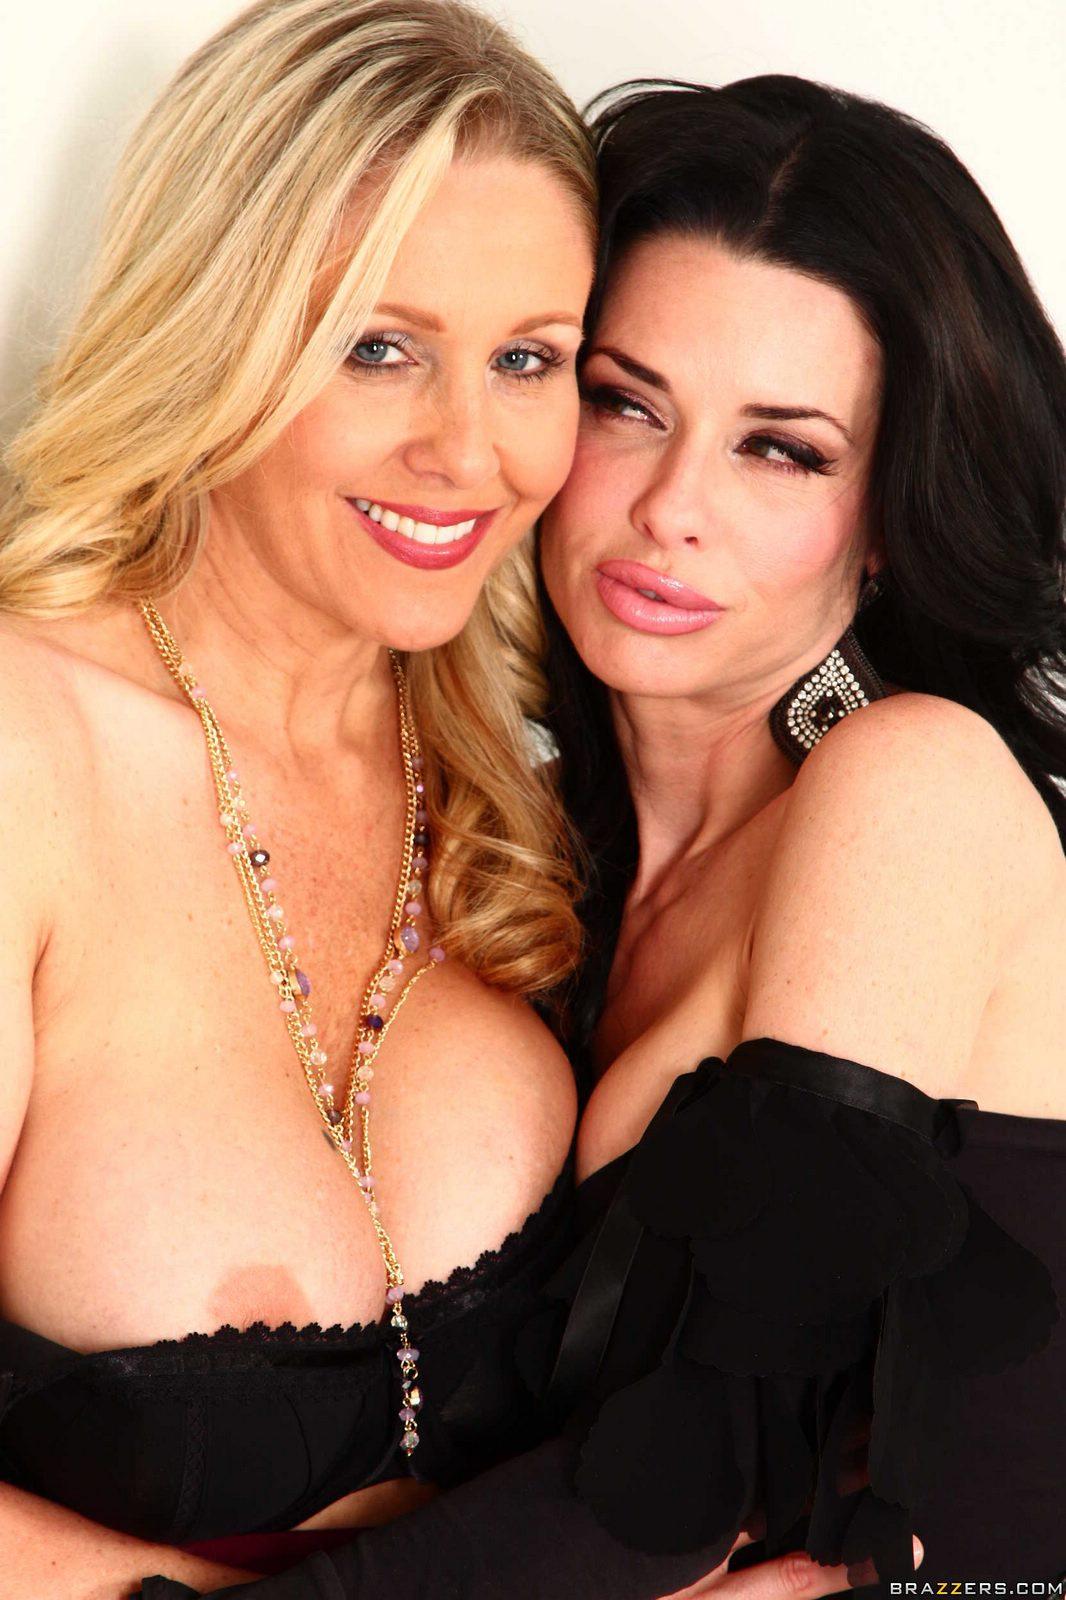 Classy mature pornstar Julia Ann having nice ass oiled after hose removal № 1391270 без смс